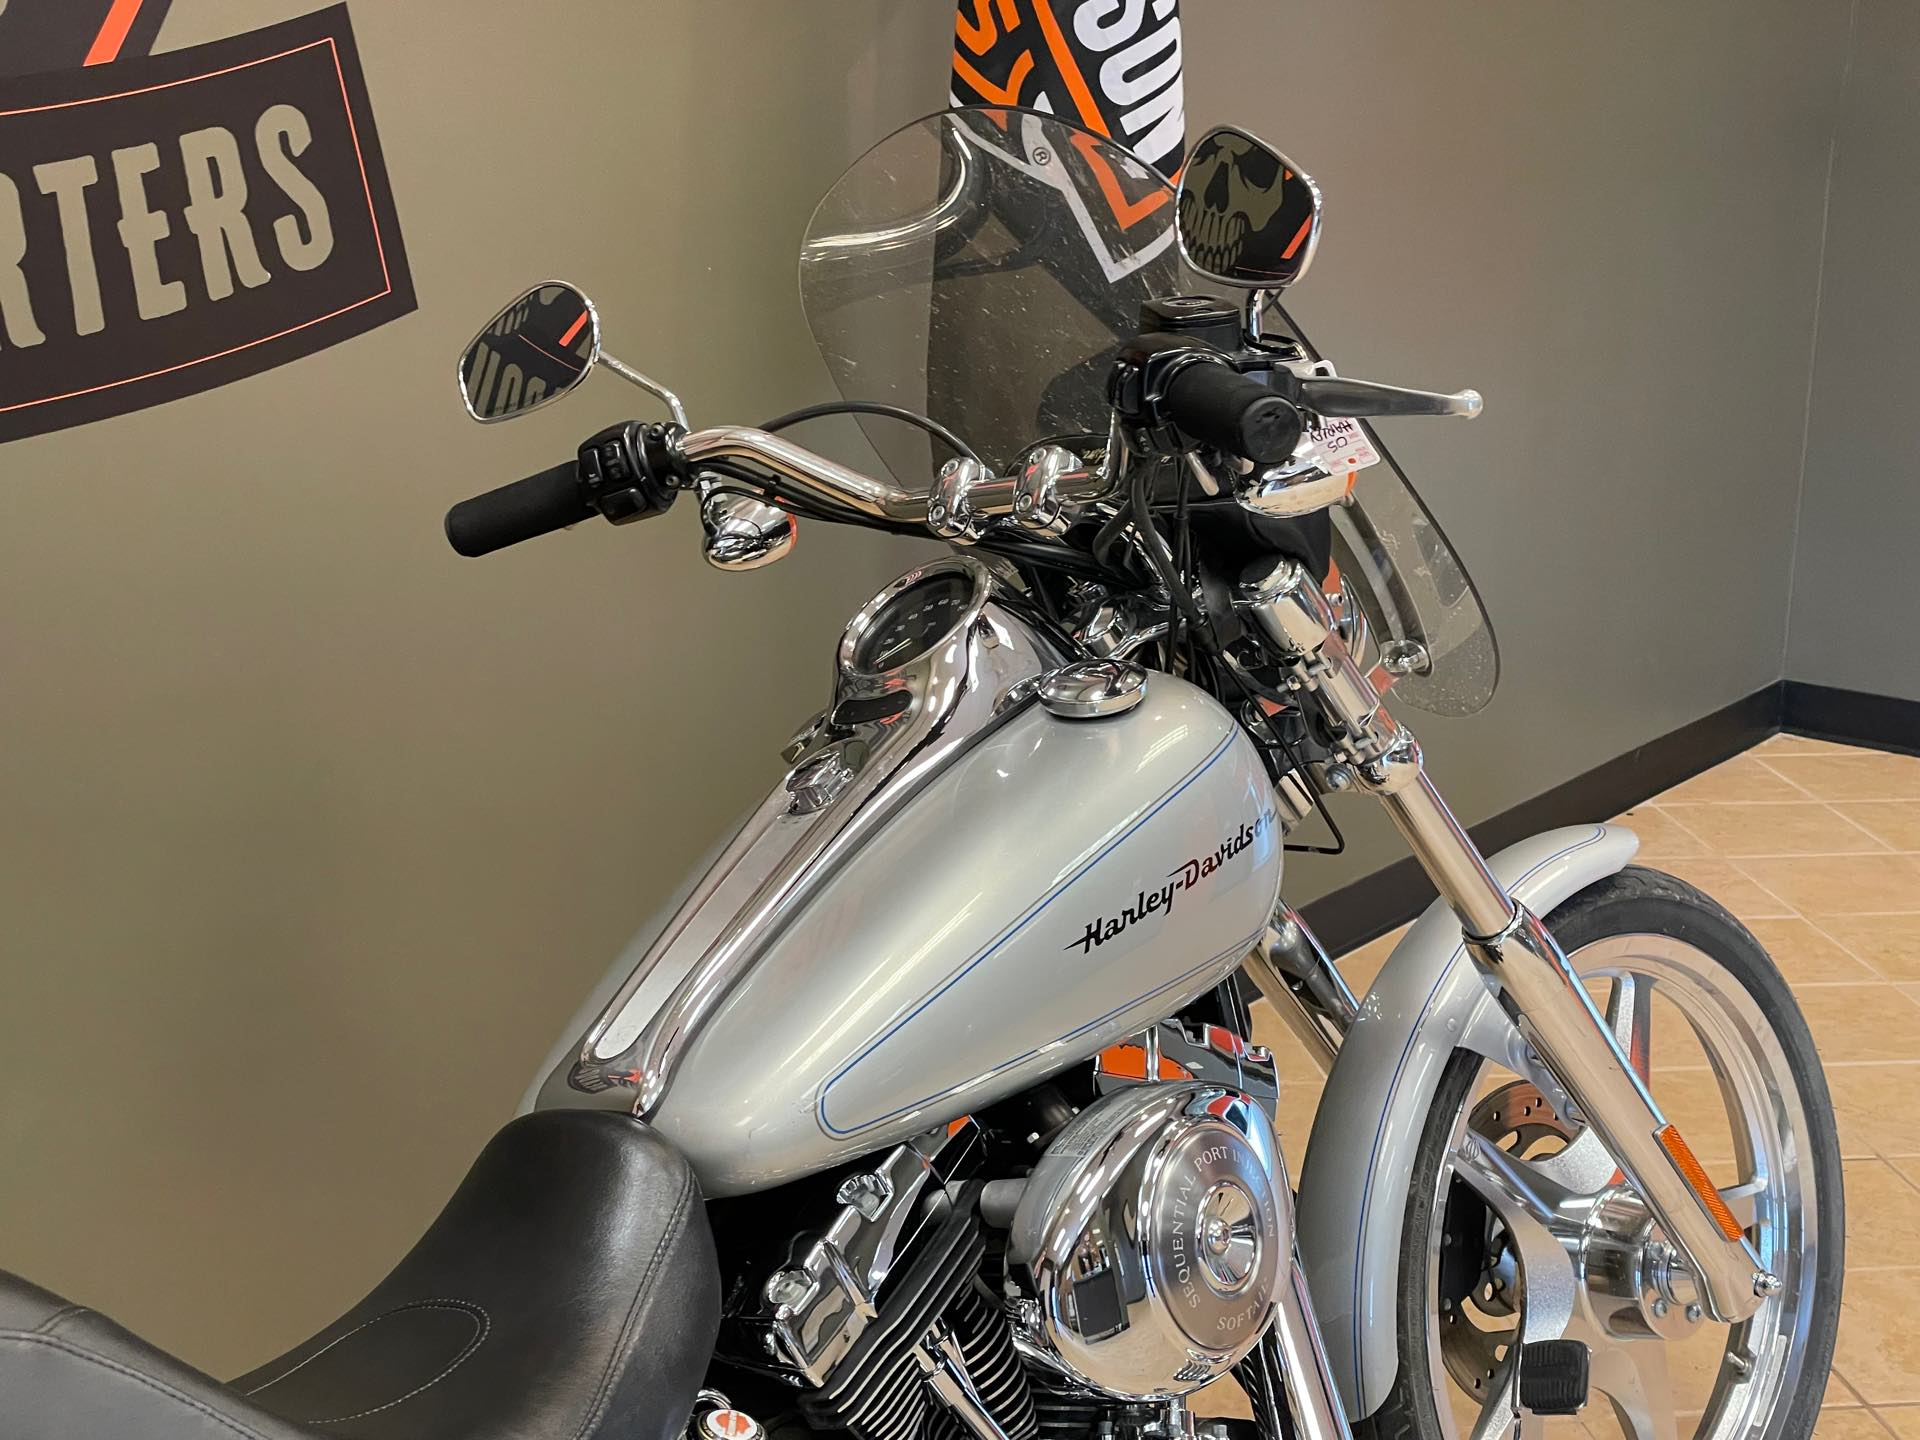 2005 Harley-Davidson Softail Deuce at Loess Hills Harley-Davidson